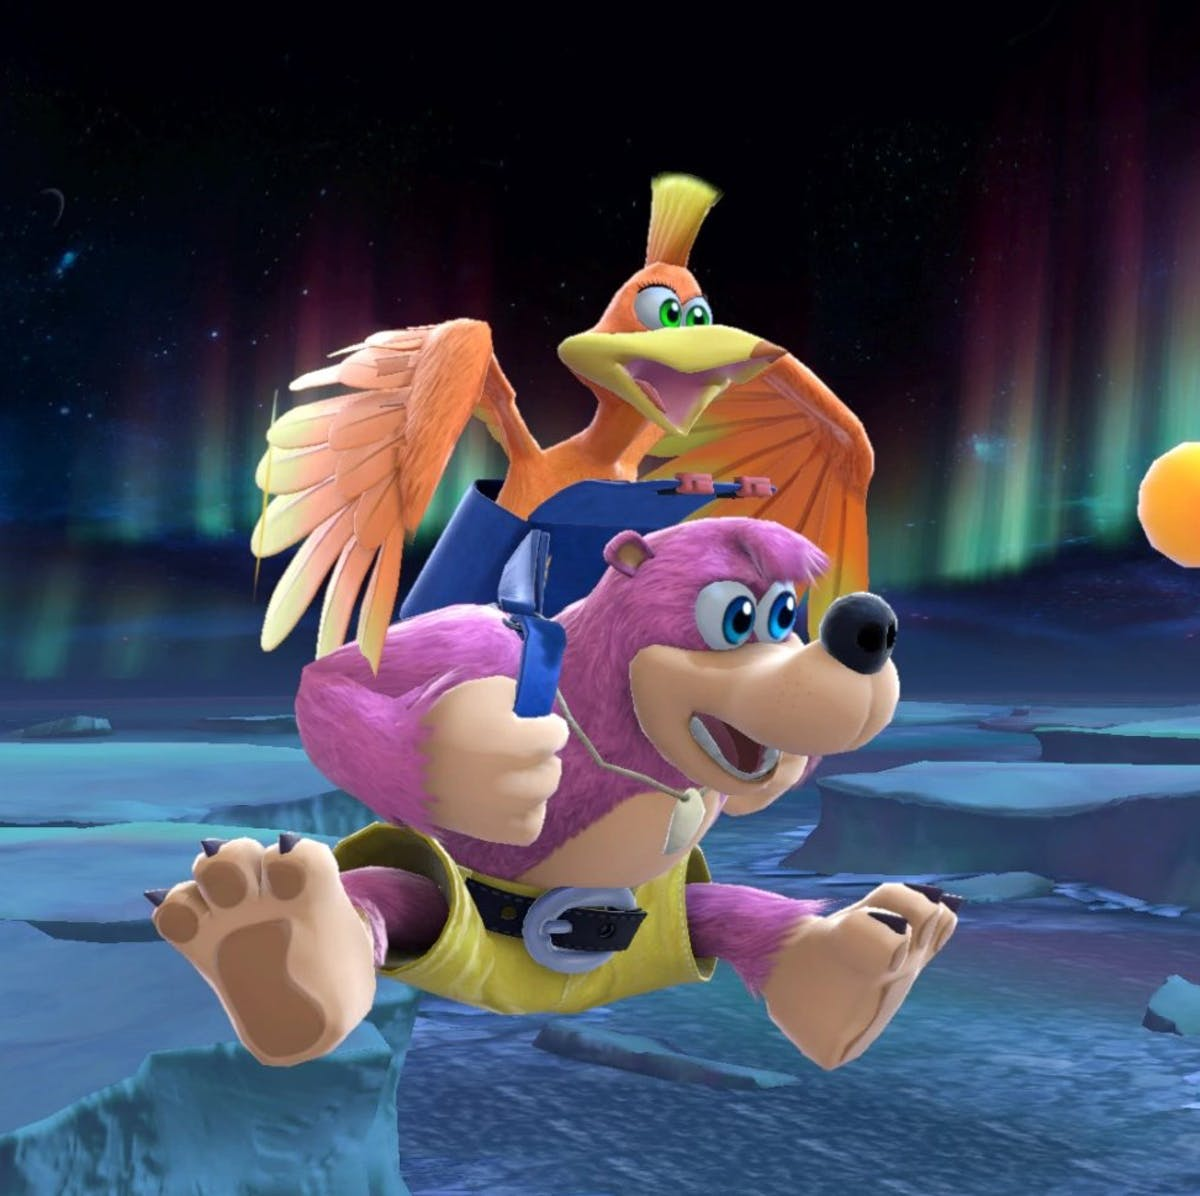 Banjo-Kazooie ranks surprisingly high in new 'Smash Ultimate' tier lists